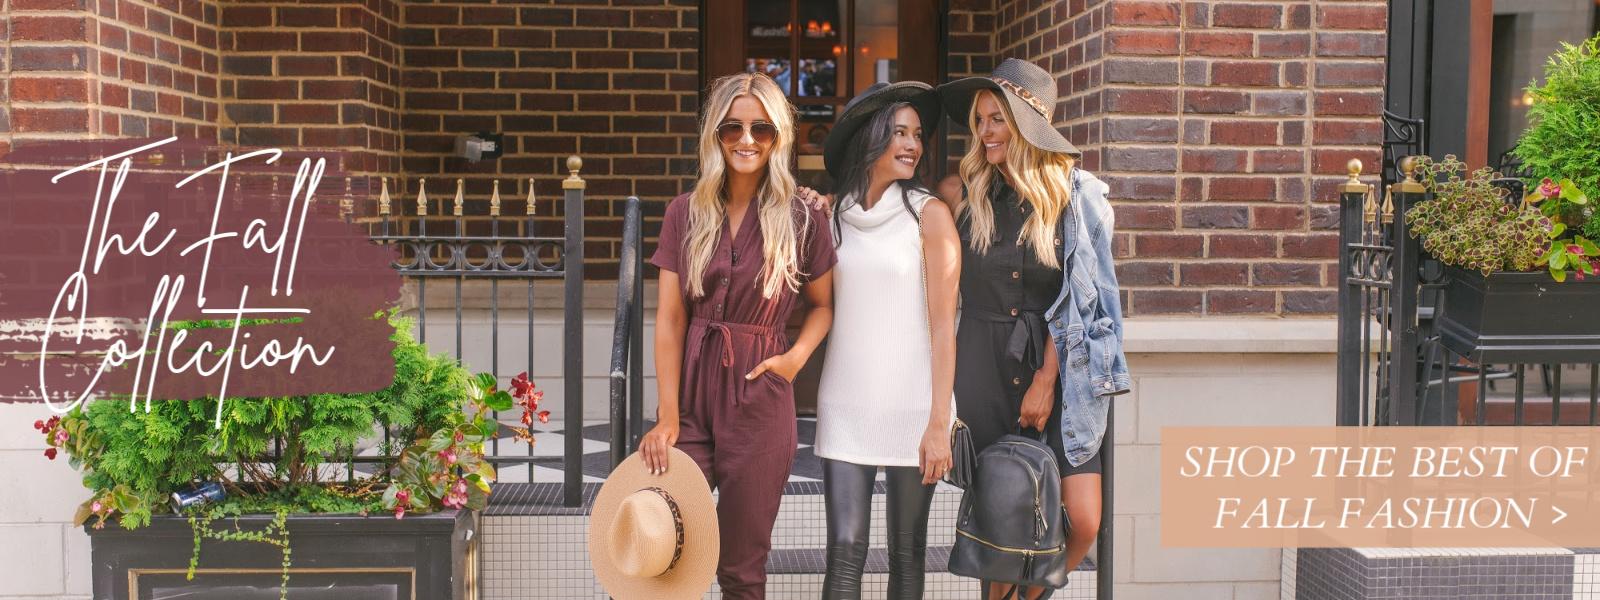 Fashion Boutique | Fast and Free Shipping | Magnolia Boutique